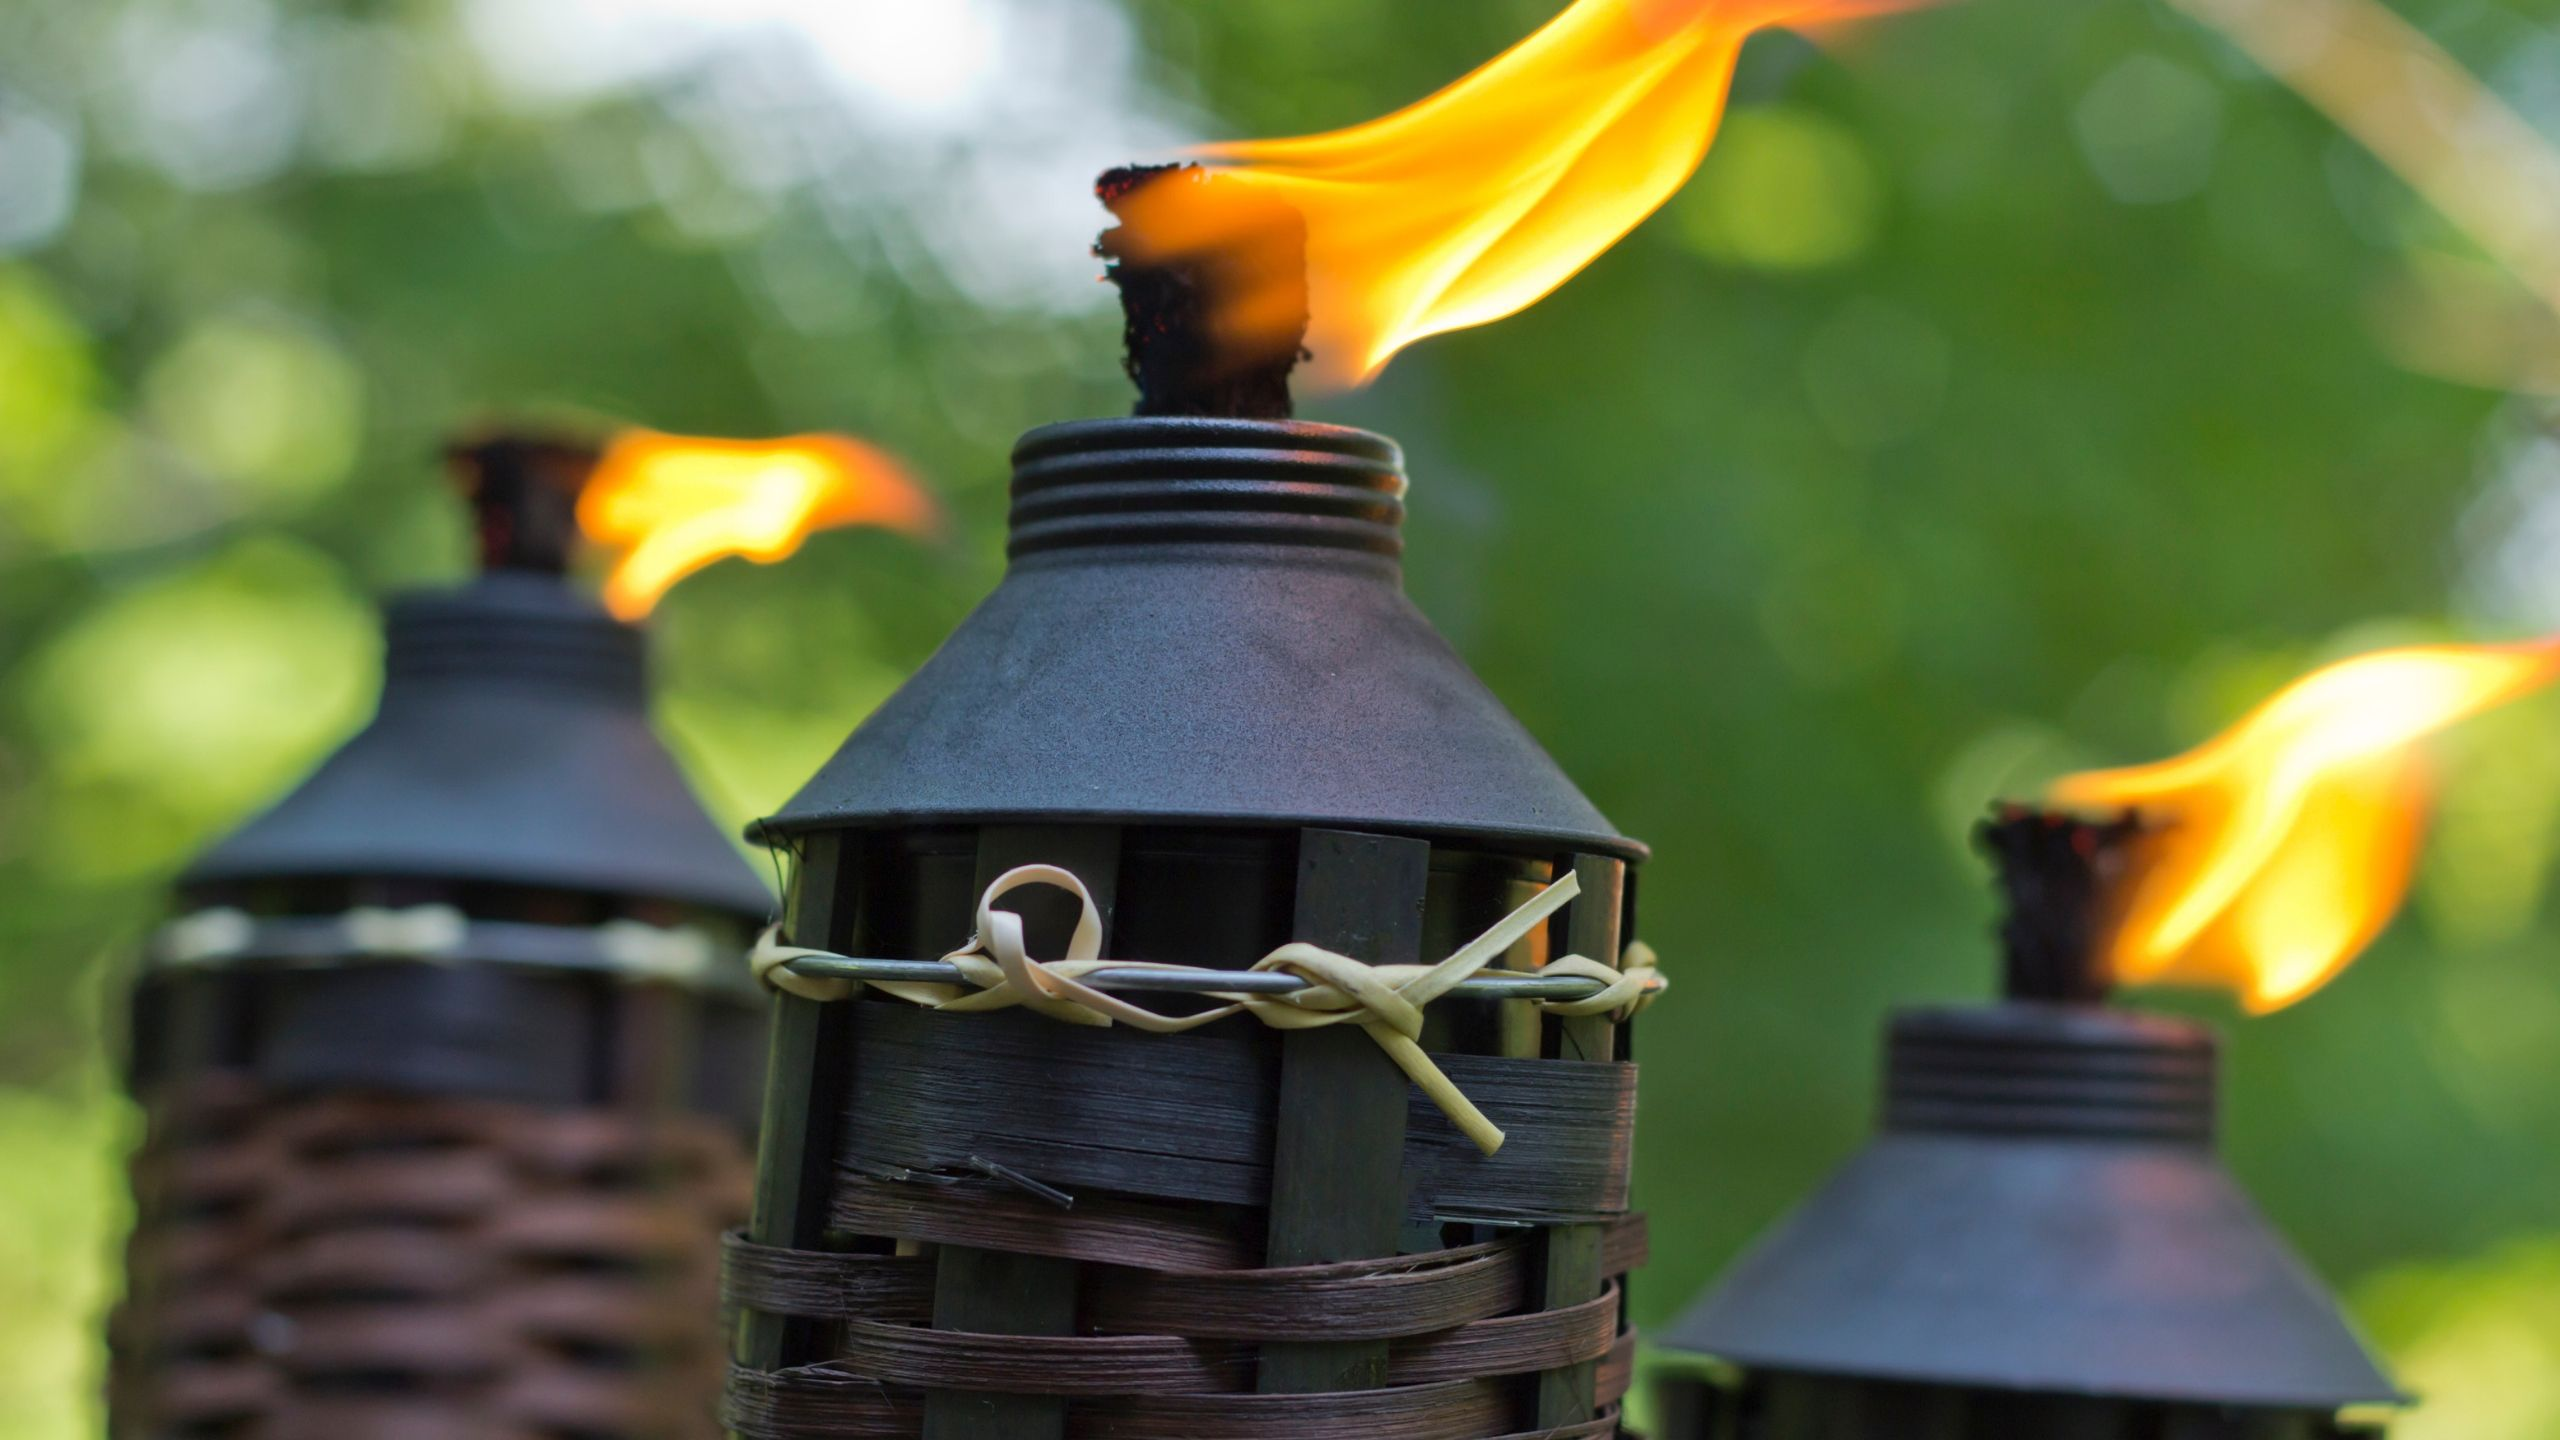 Mosquito Repellent Citronella Oil Burners